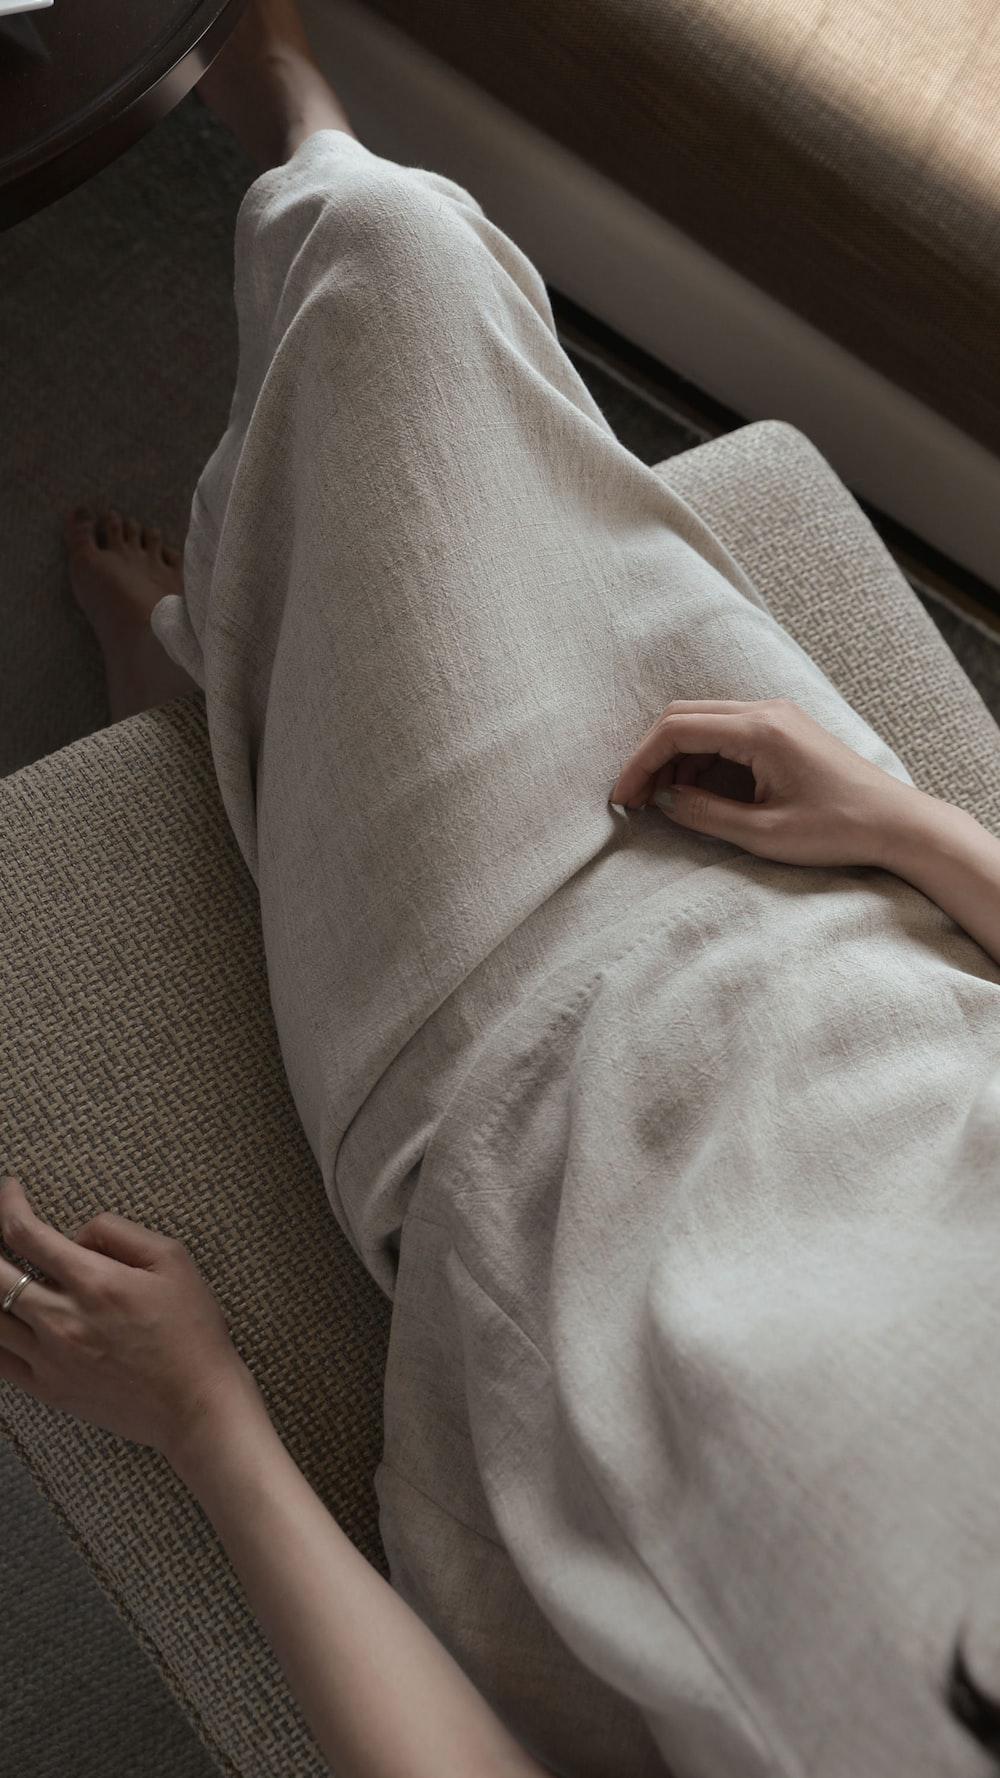 woman wearing white dress sitting sofa chair